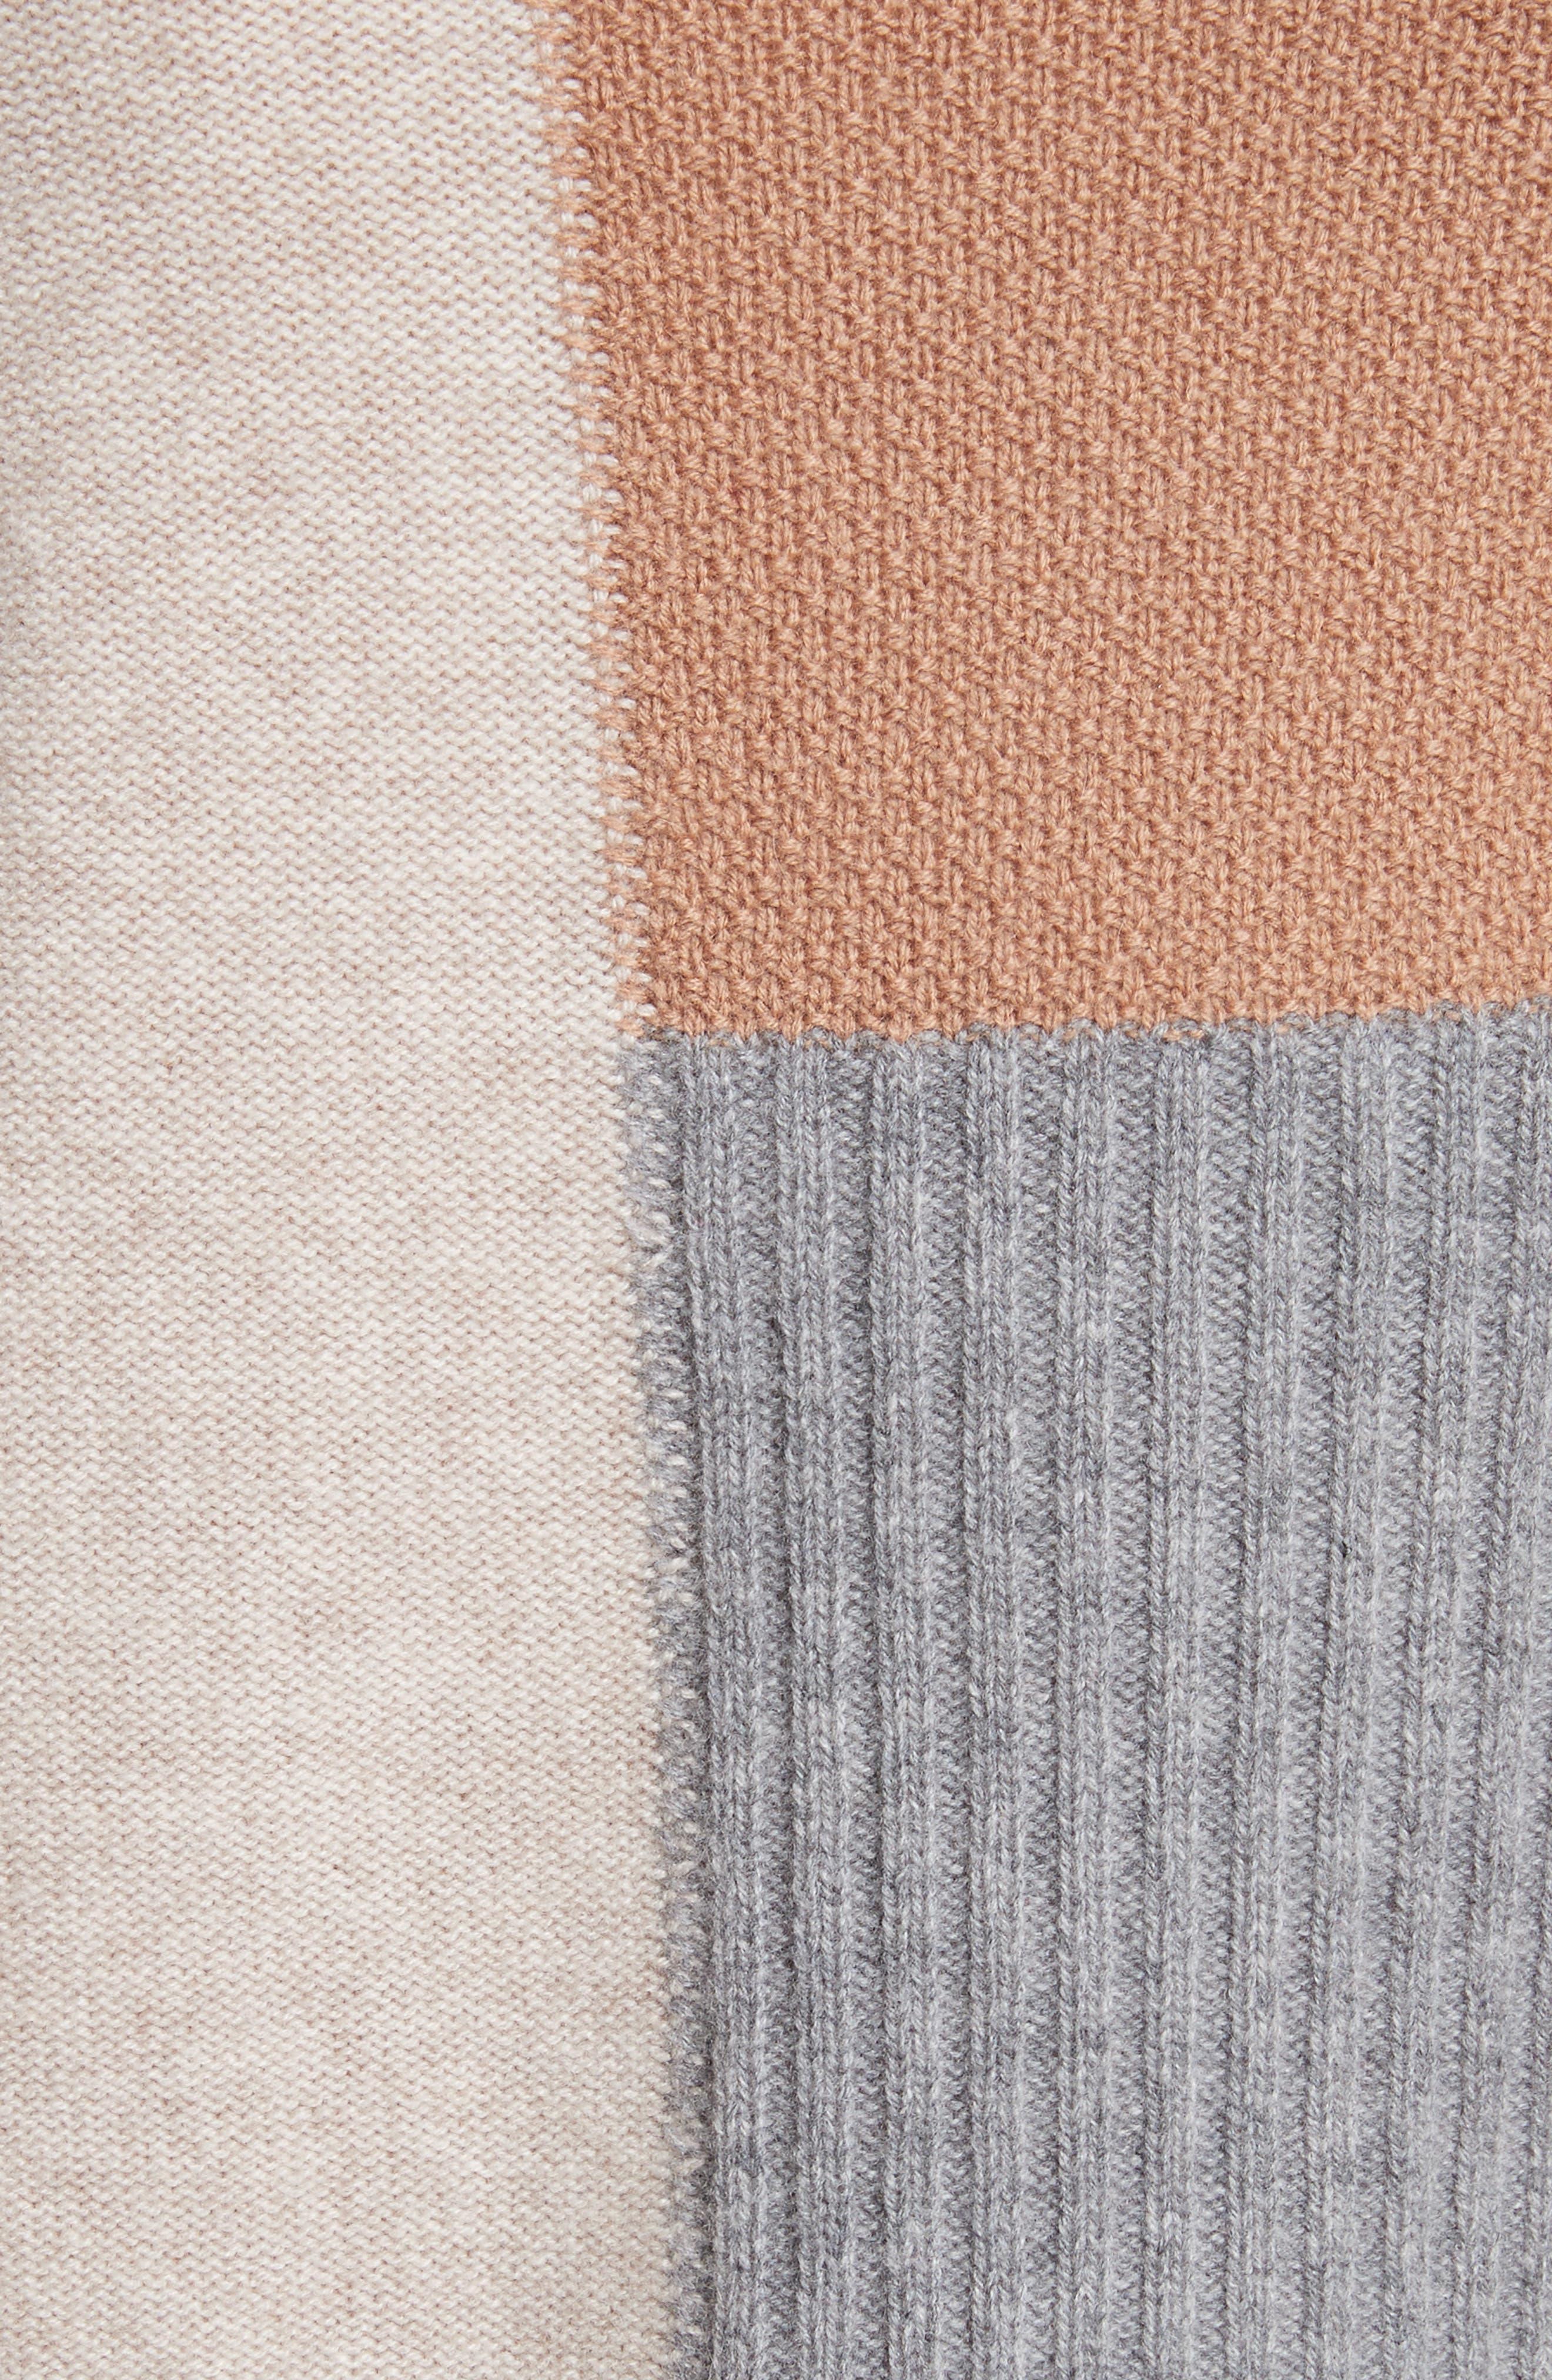 Adene Wool & Cashmere Sweater,                             Alternate thumbnail 5, color,                             641